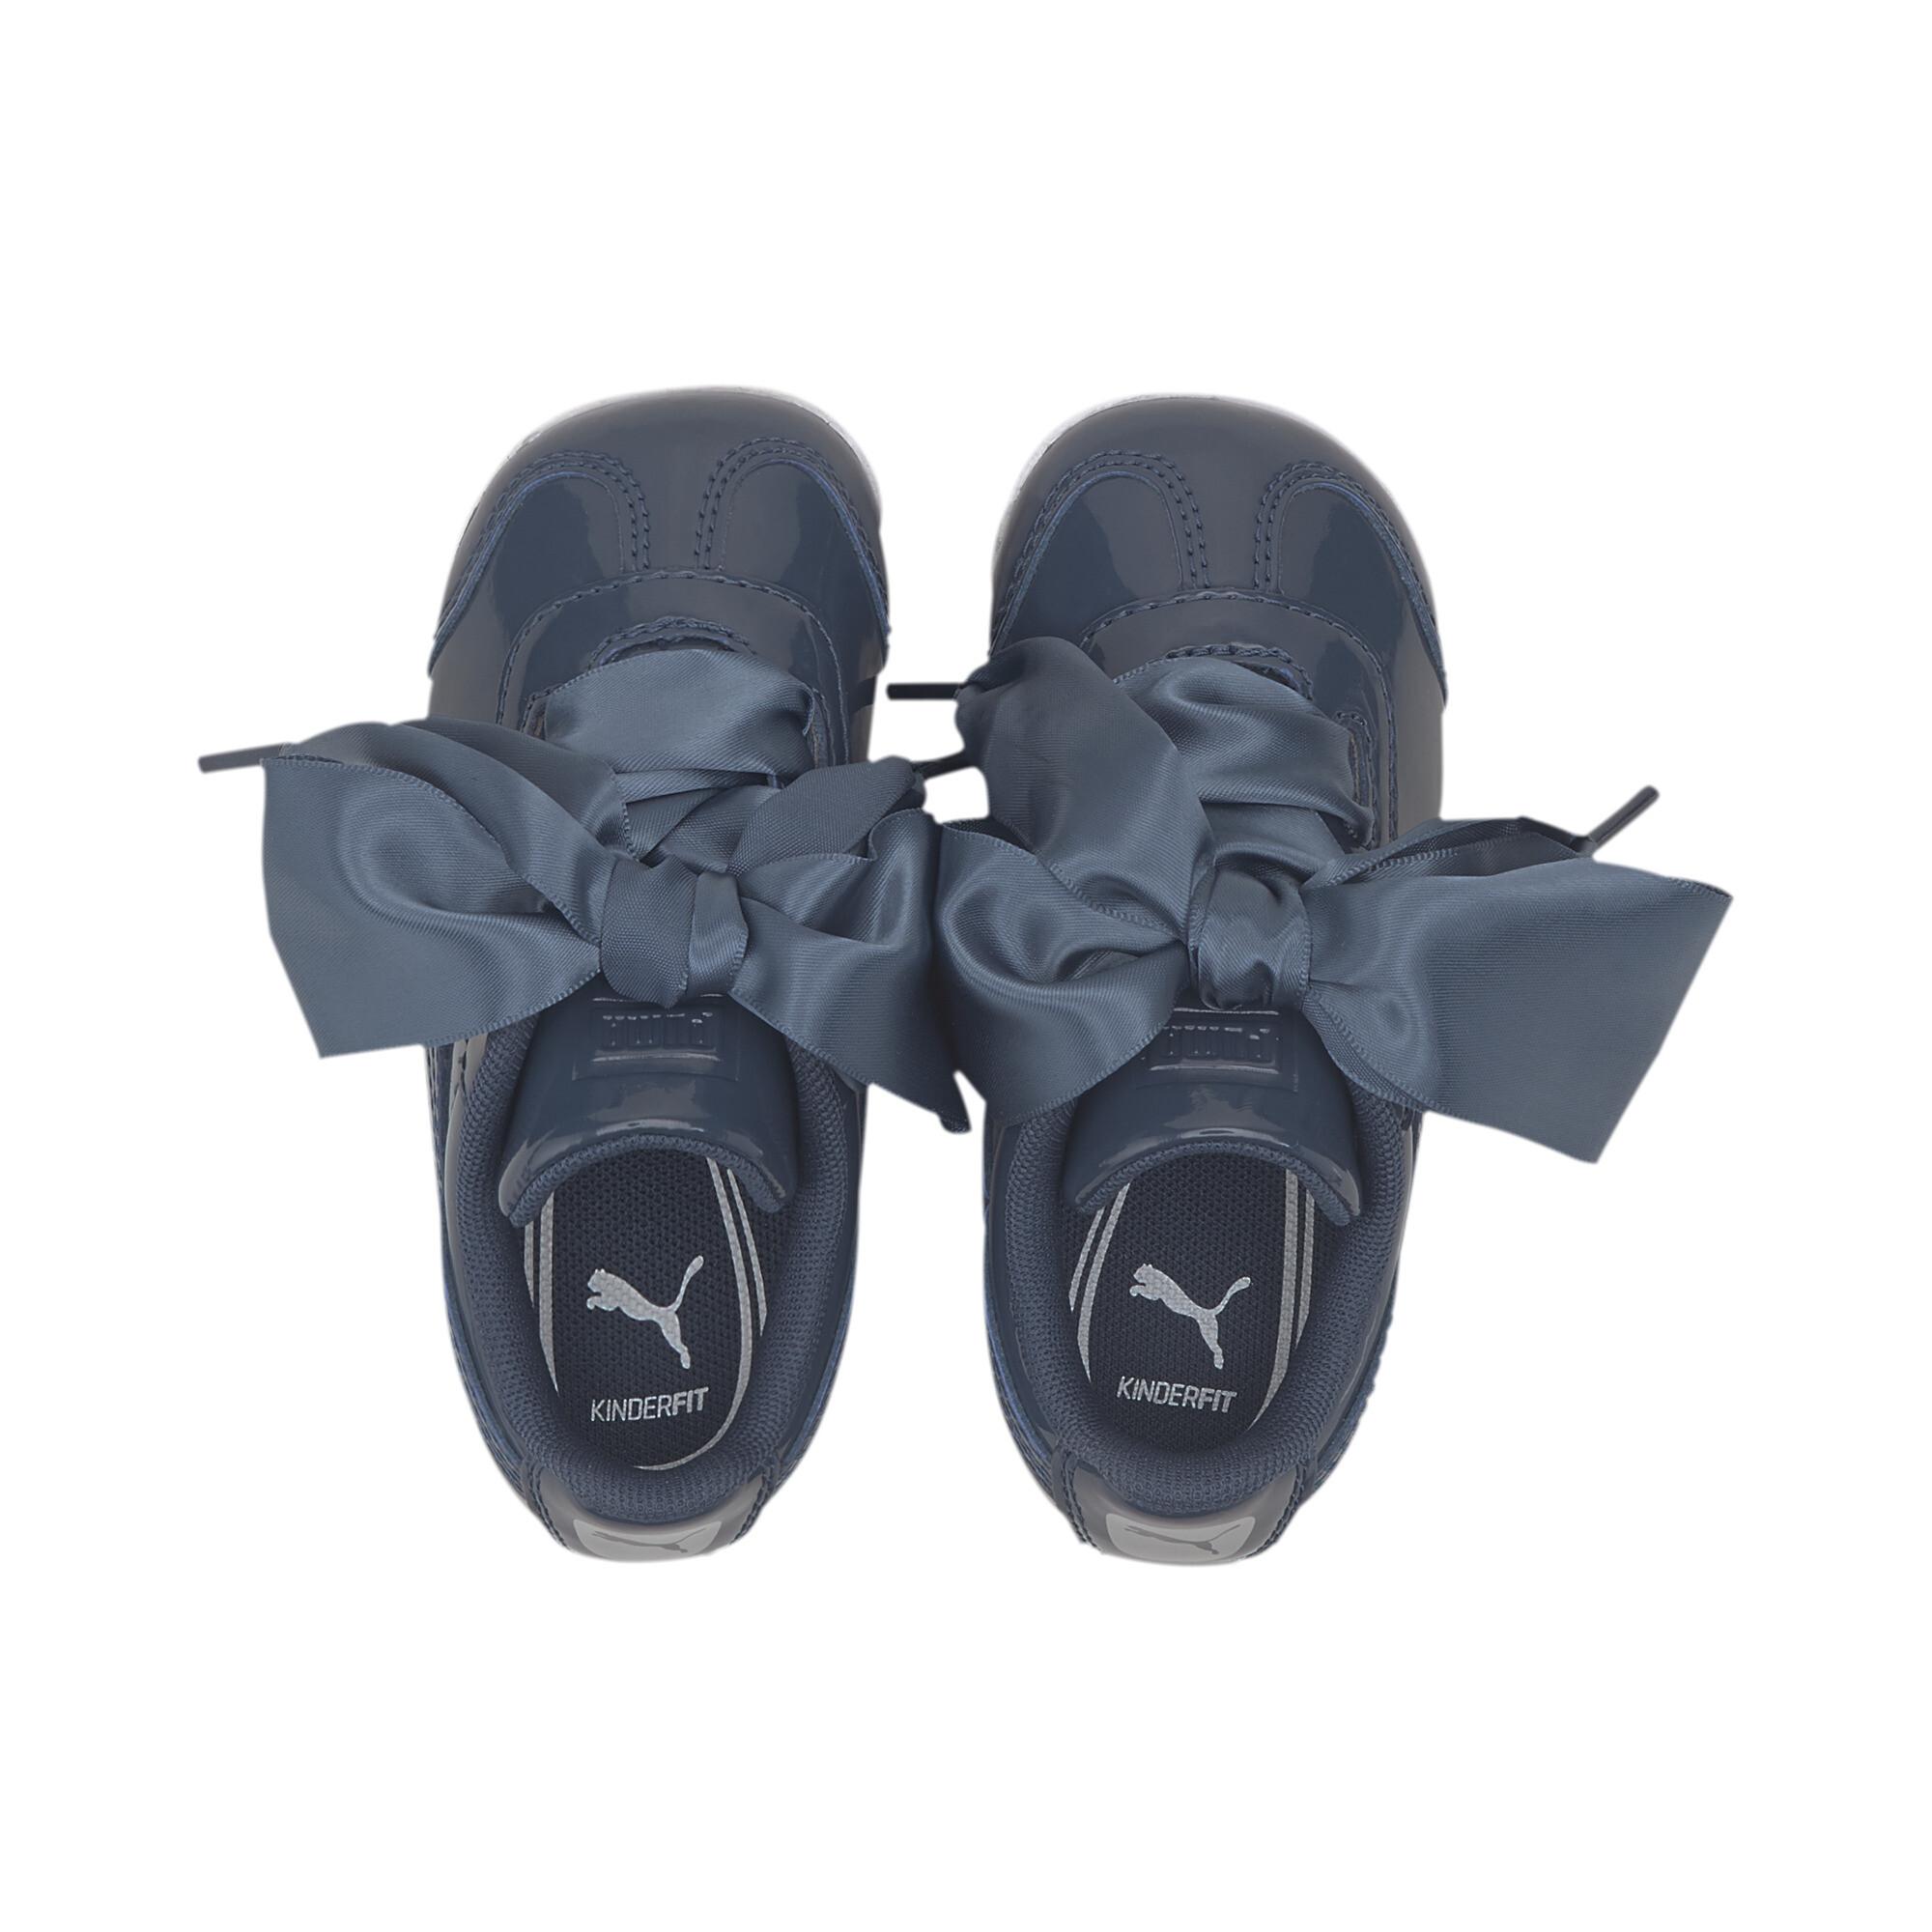 PUMA-Roma-Heart-Patent-Toddler-Shoes-Girls-Shoe-Kids thumbnail 19